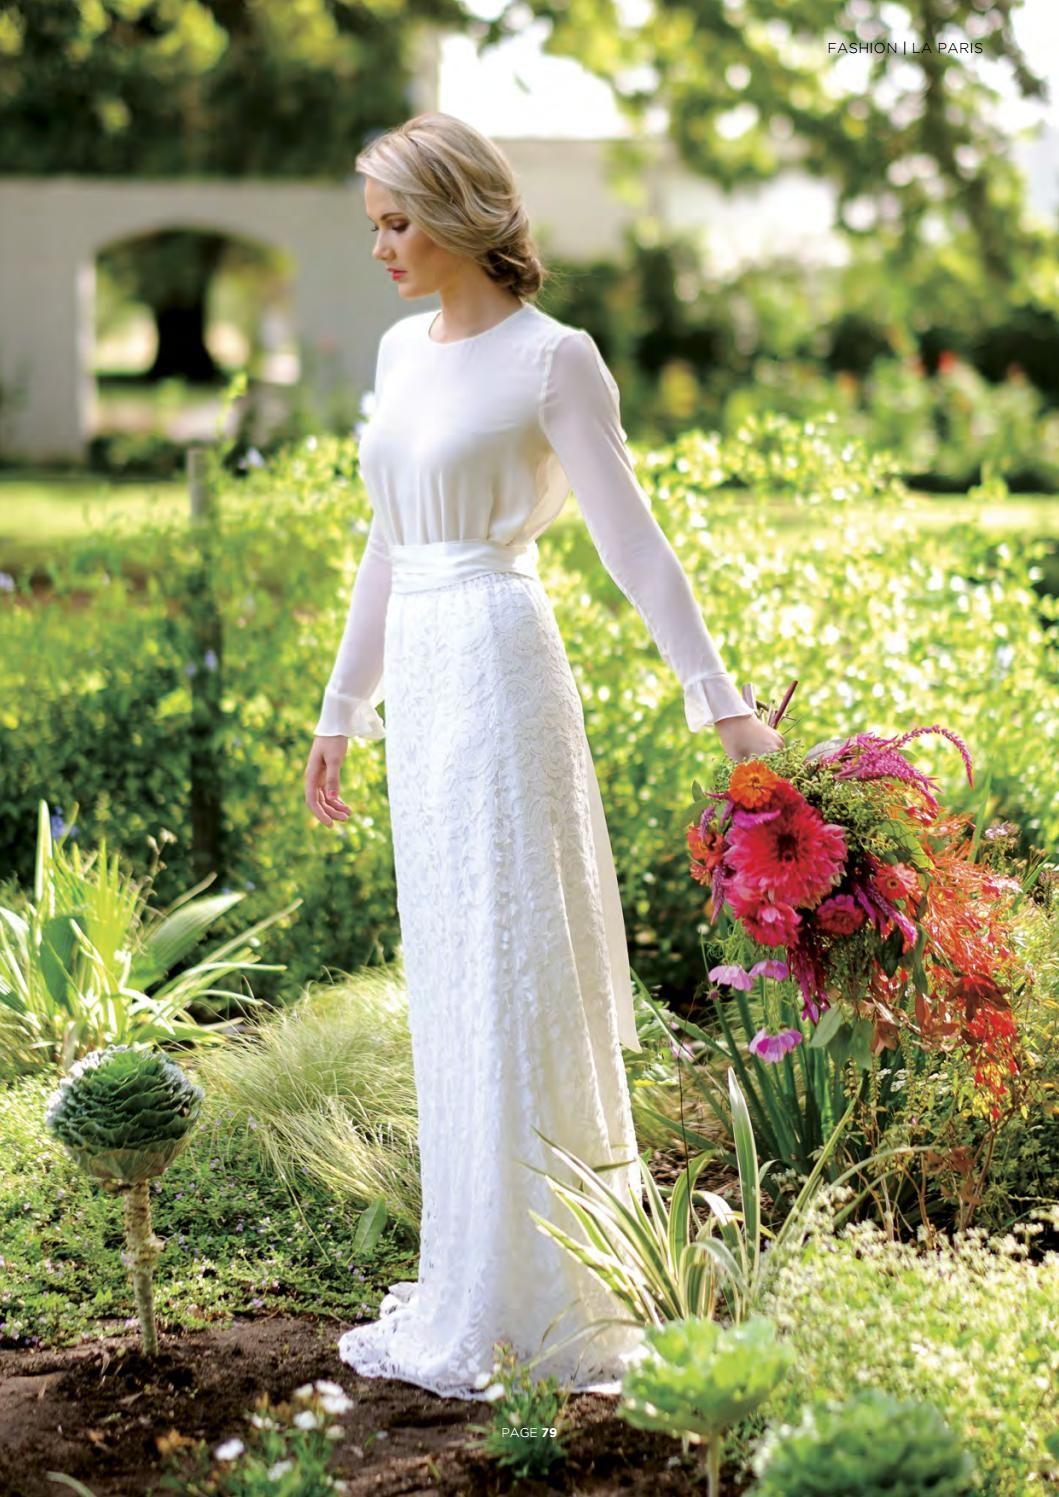 Affordable bohemian wedding dresses  My Wedding Day Bridal Magazine Issue   Weddings and Wedding